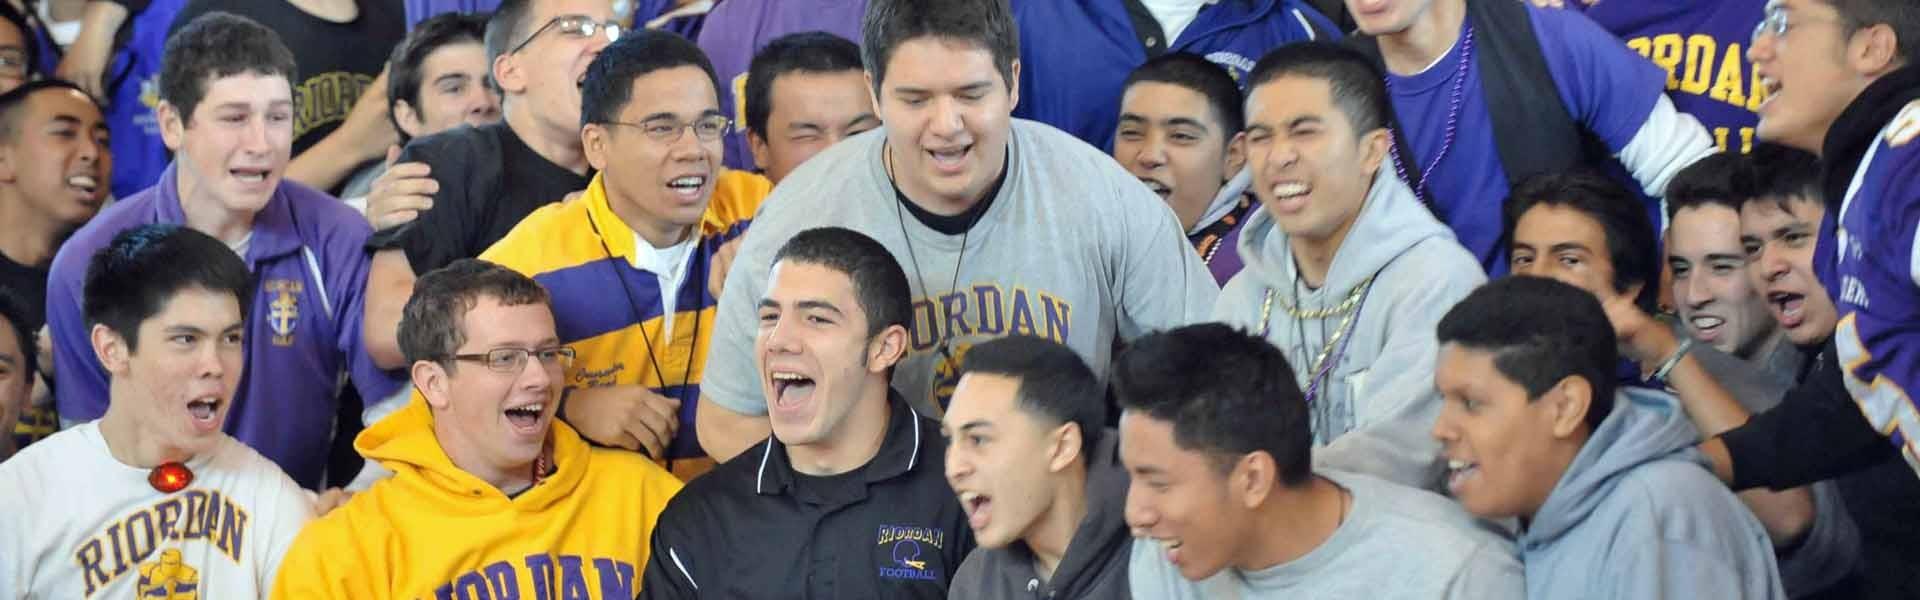 ArchbishopRiordanHighSchool-highschool-California-Cheering-Main-BAnner-2019